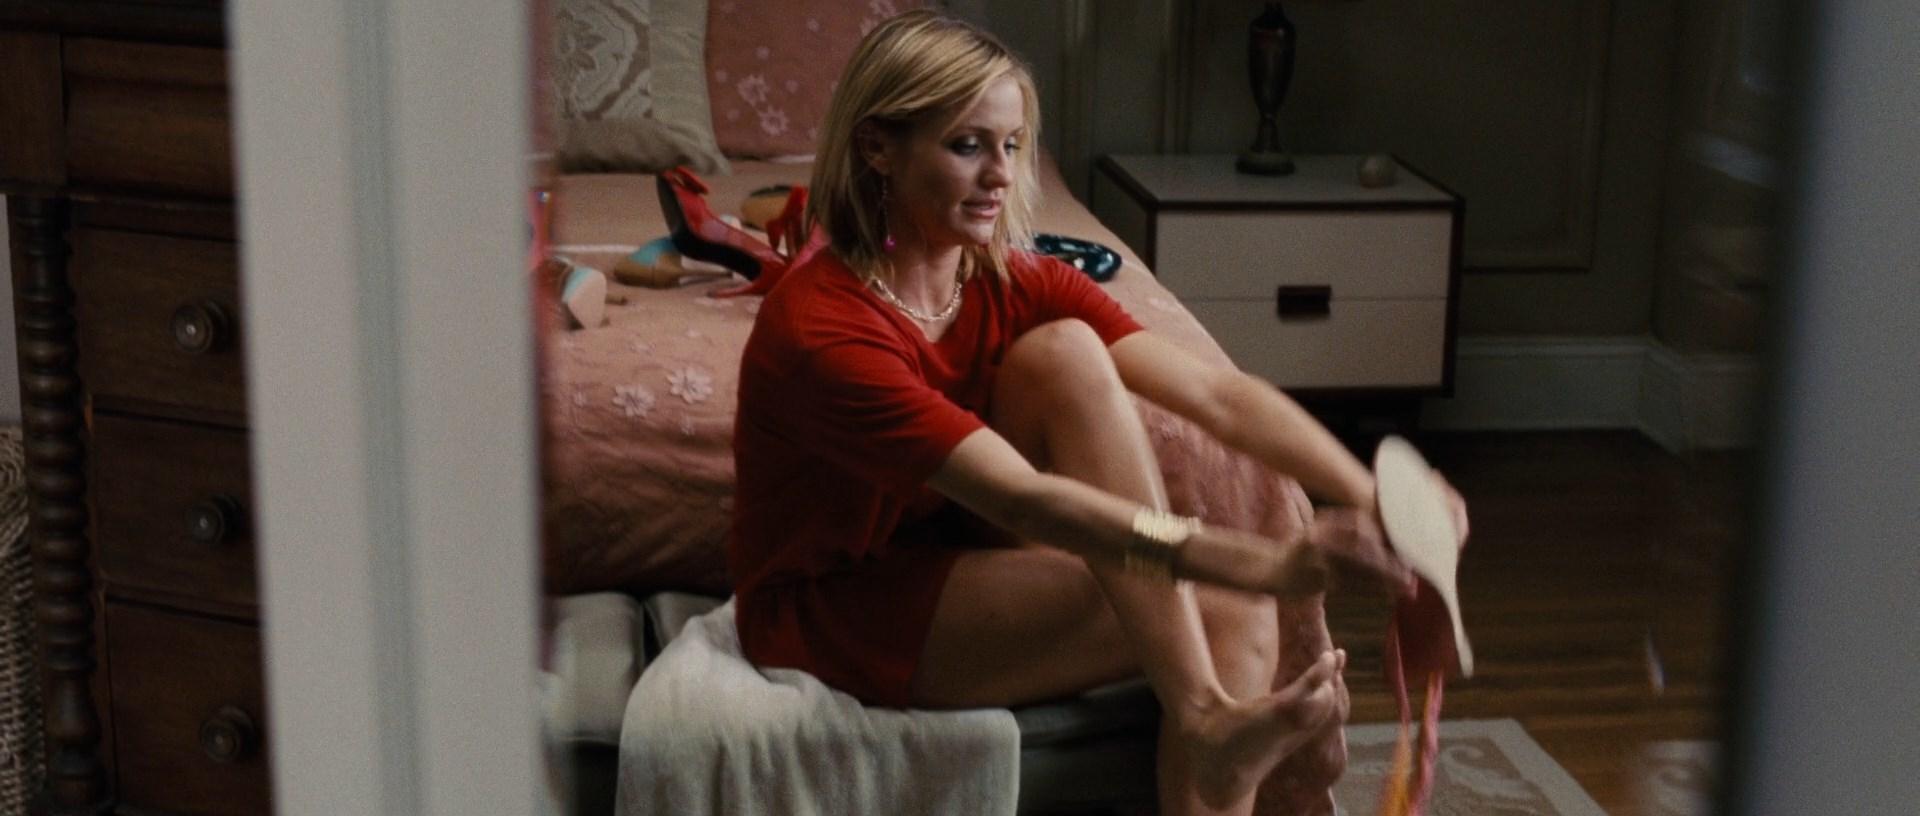 34917dcb8816e Cameron Diaz's Feet << wikiFeet